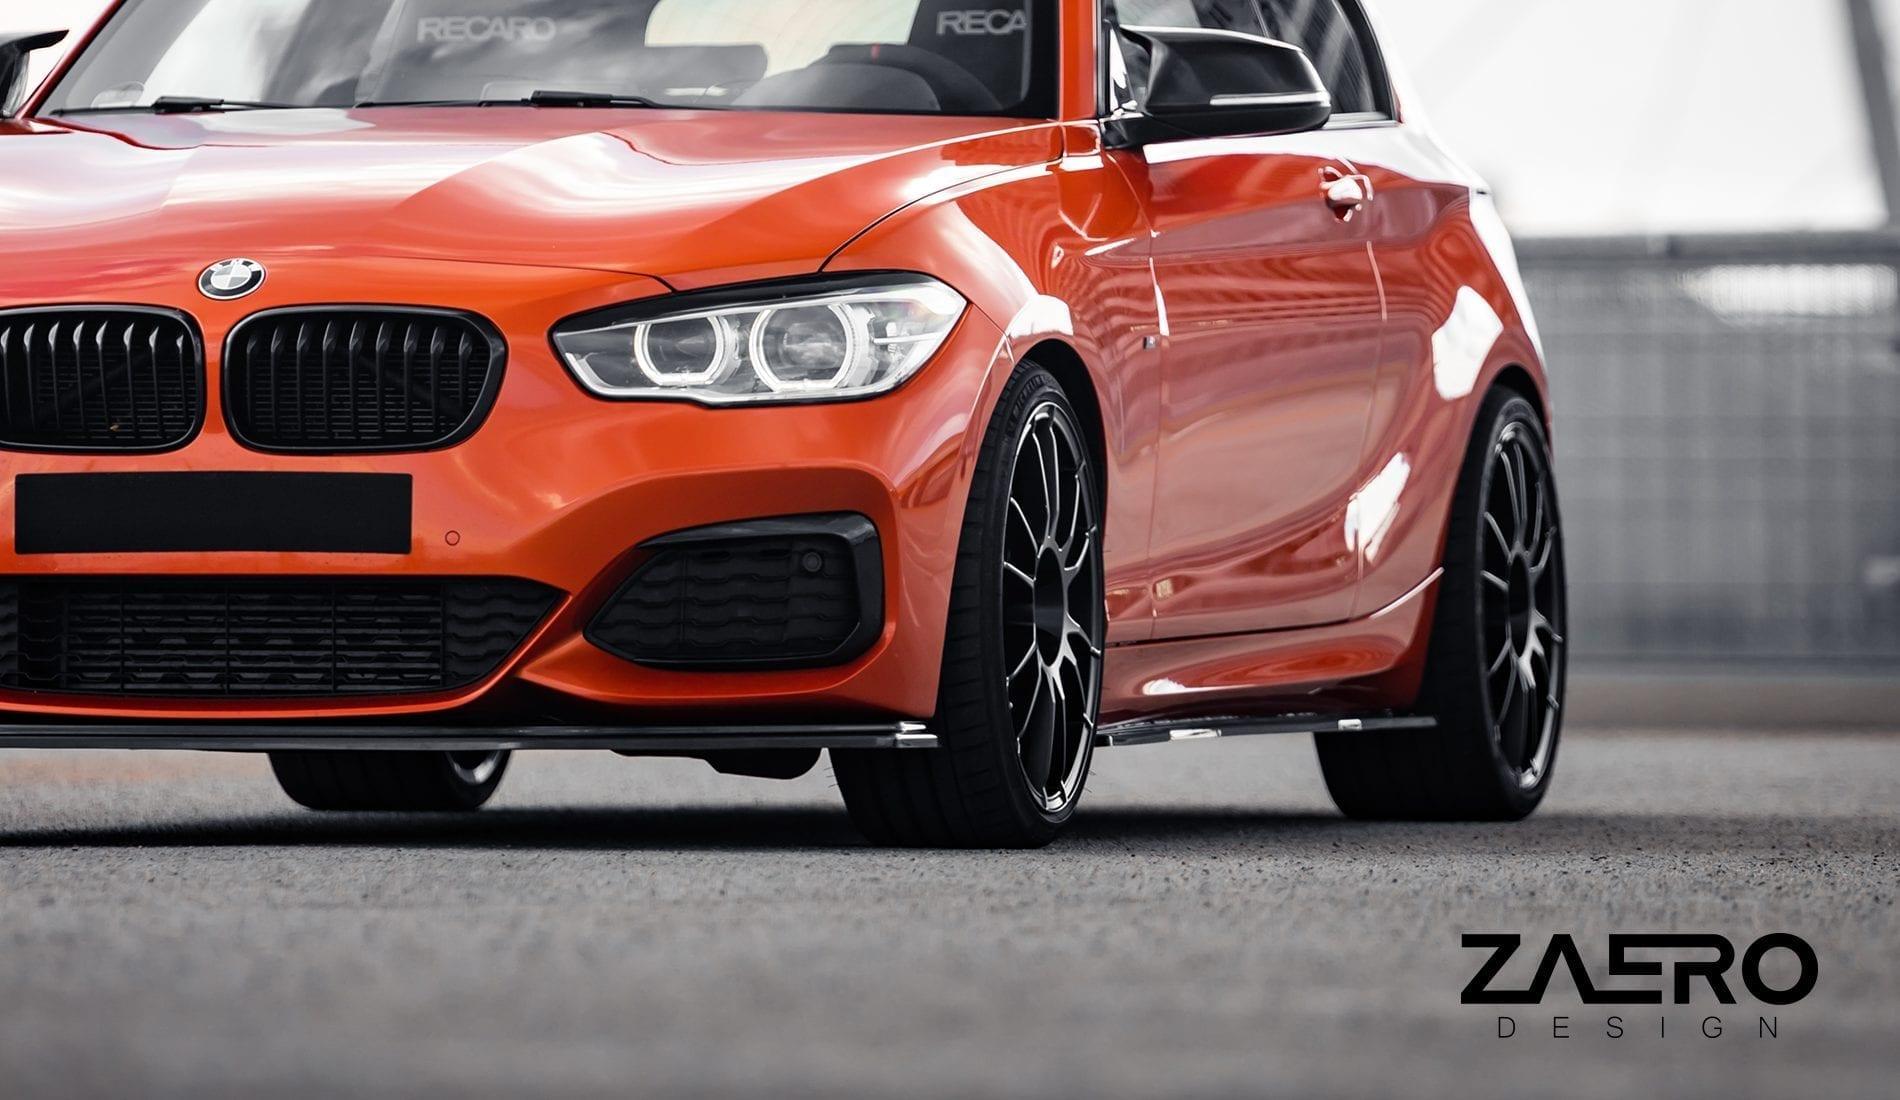 ZAERO-DESIGN-EVO-1-BODY-KIT-FOR-BMW-1-SERIES-116i-118i-120i-125i-M135-M140-F20-F21-FRONT-SPLITTER-SPOILER-AERO-KIT-REAR-DIFFUSOR-FLAPS-CUP-SIDE-SKIRTS